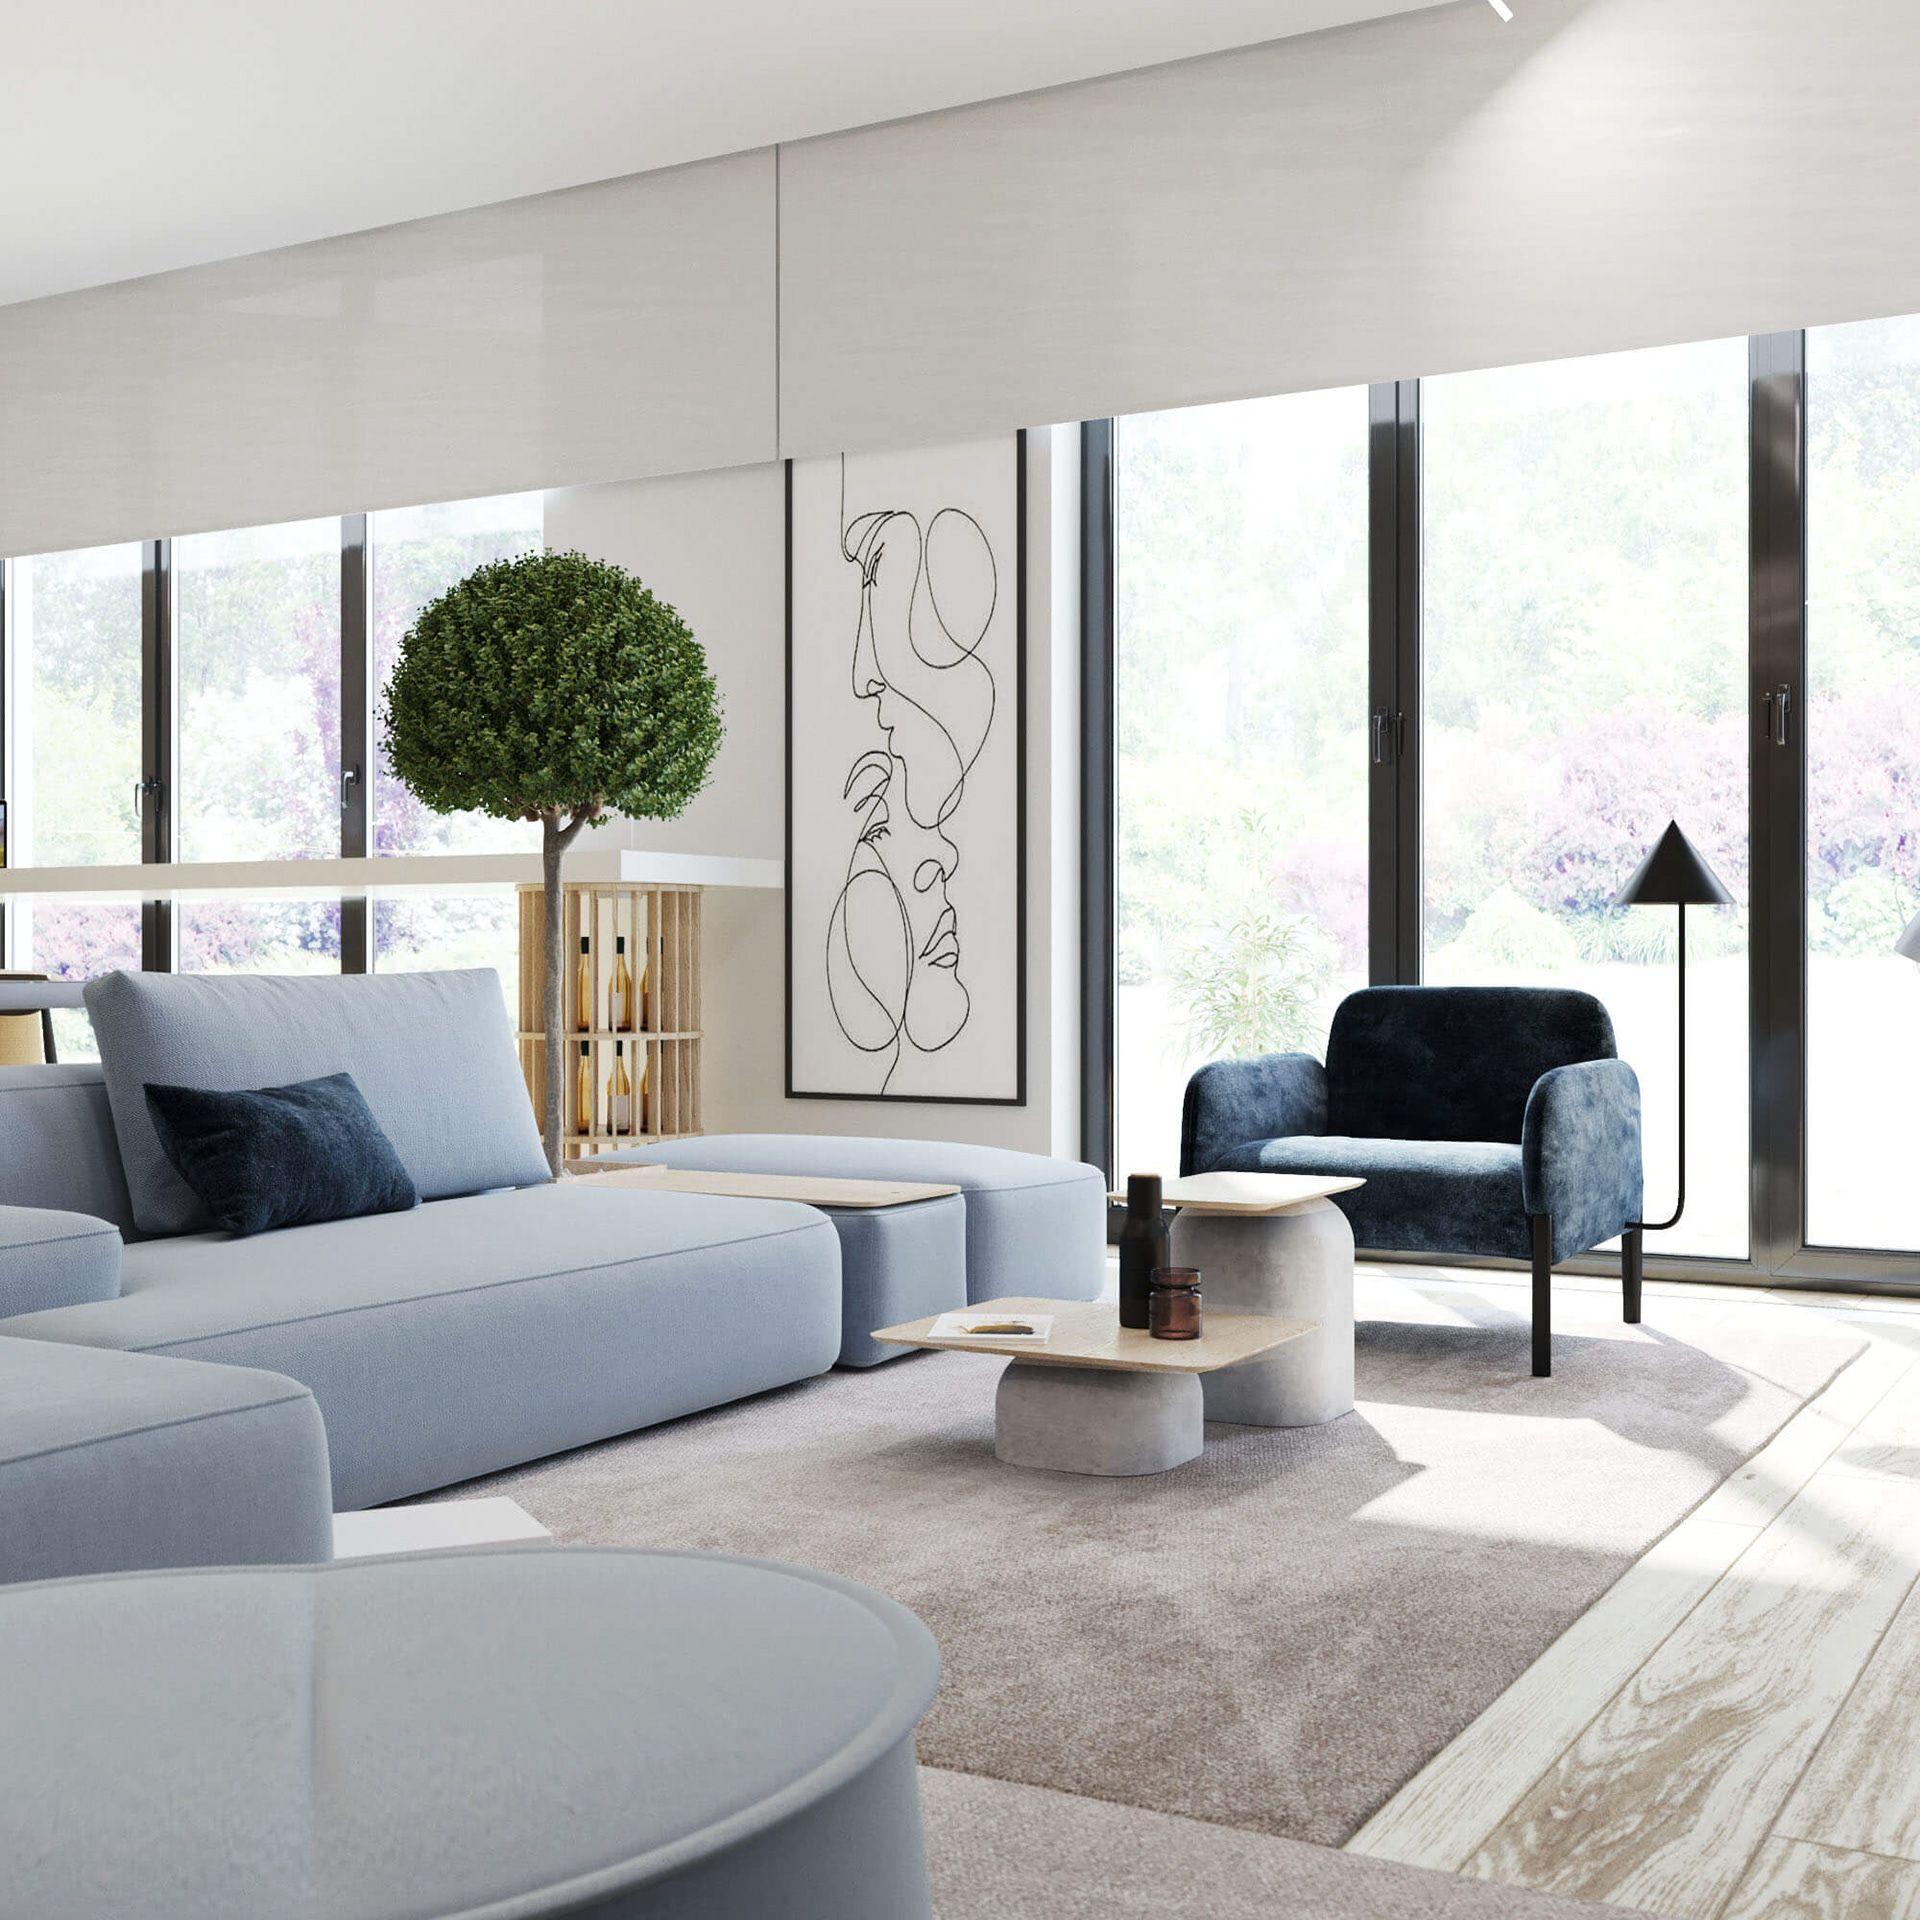 51 Modern Living Room Design From Talented Architects: Https://www.behance.net/gallery/87831109/Interior-Design